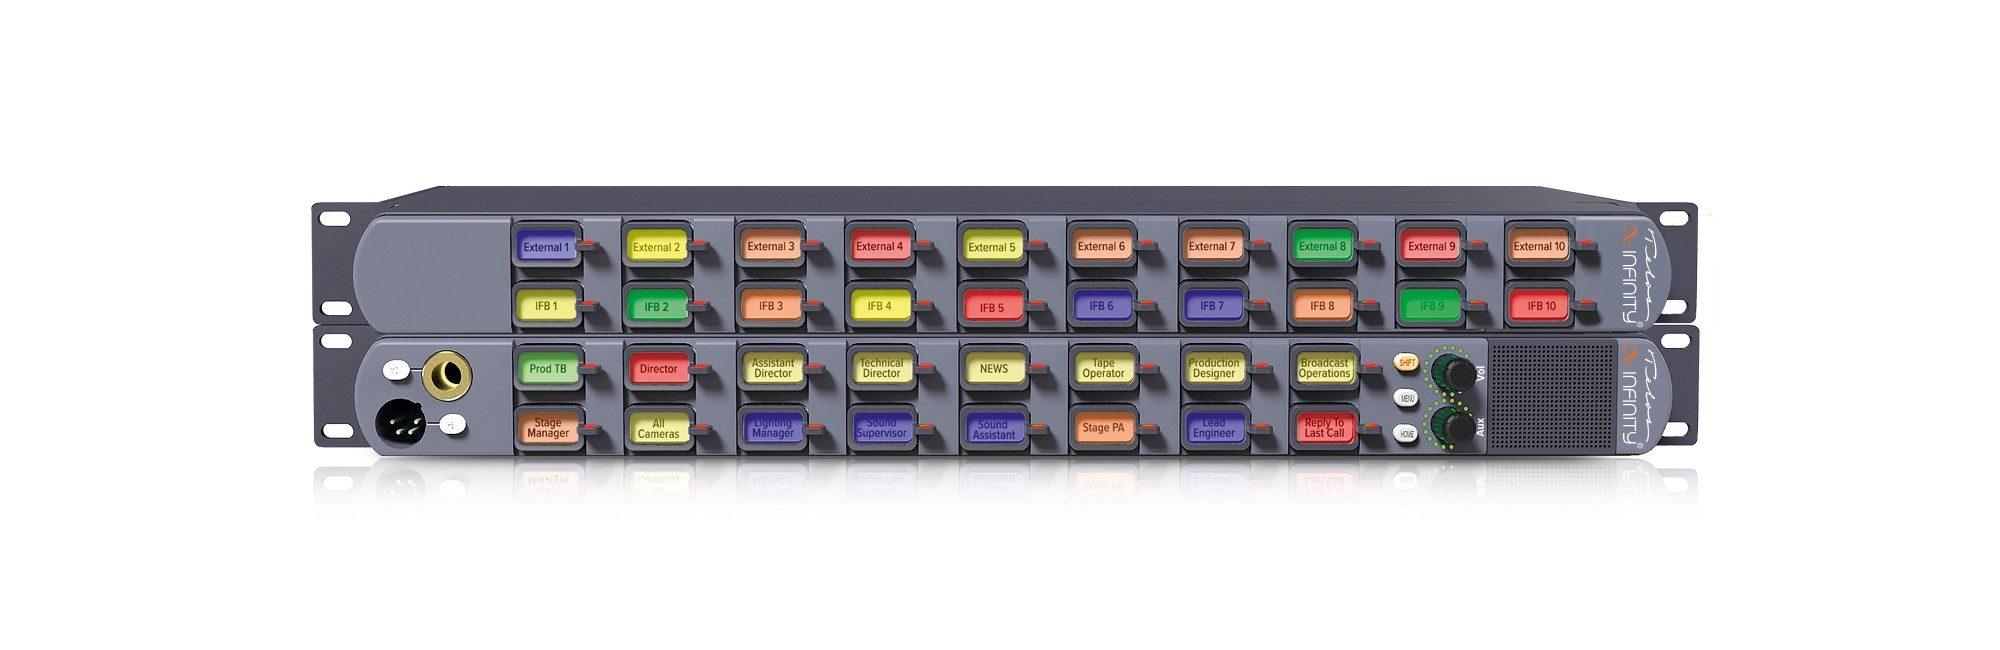 Système d'Intercom Telos Infinity